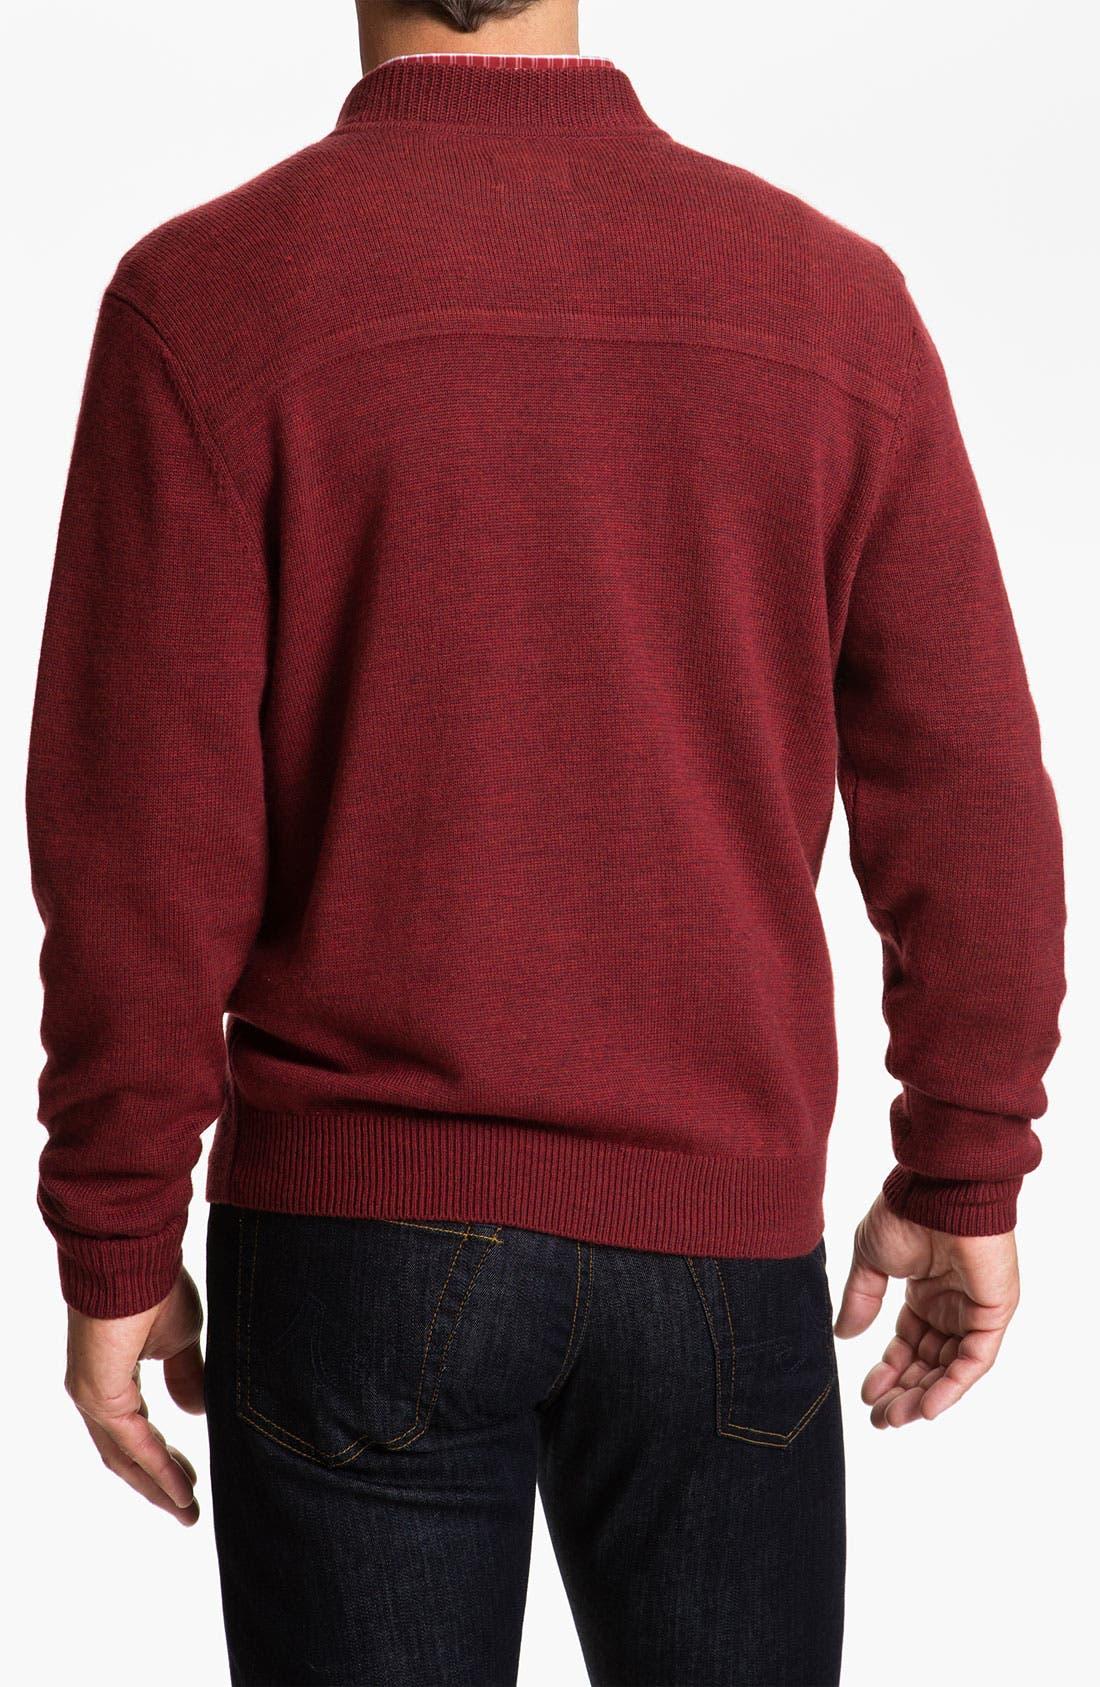 Alternate Image 2  - Cutter & Buck 'Brandywine' Argyle Textured Merino Wool Sweater (Big & Tall)